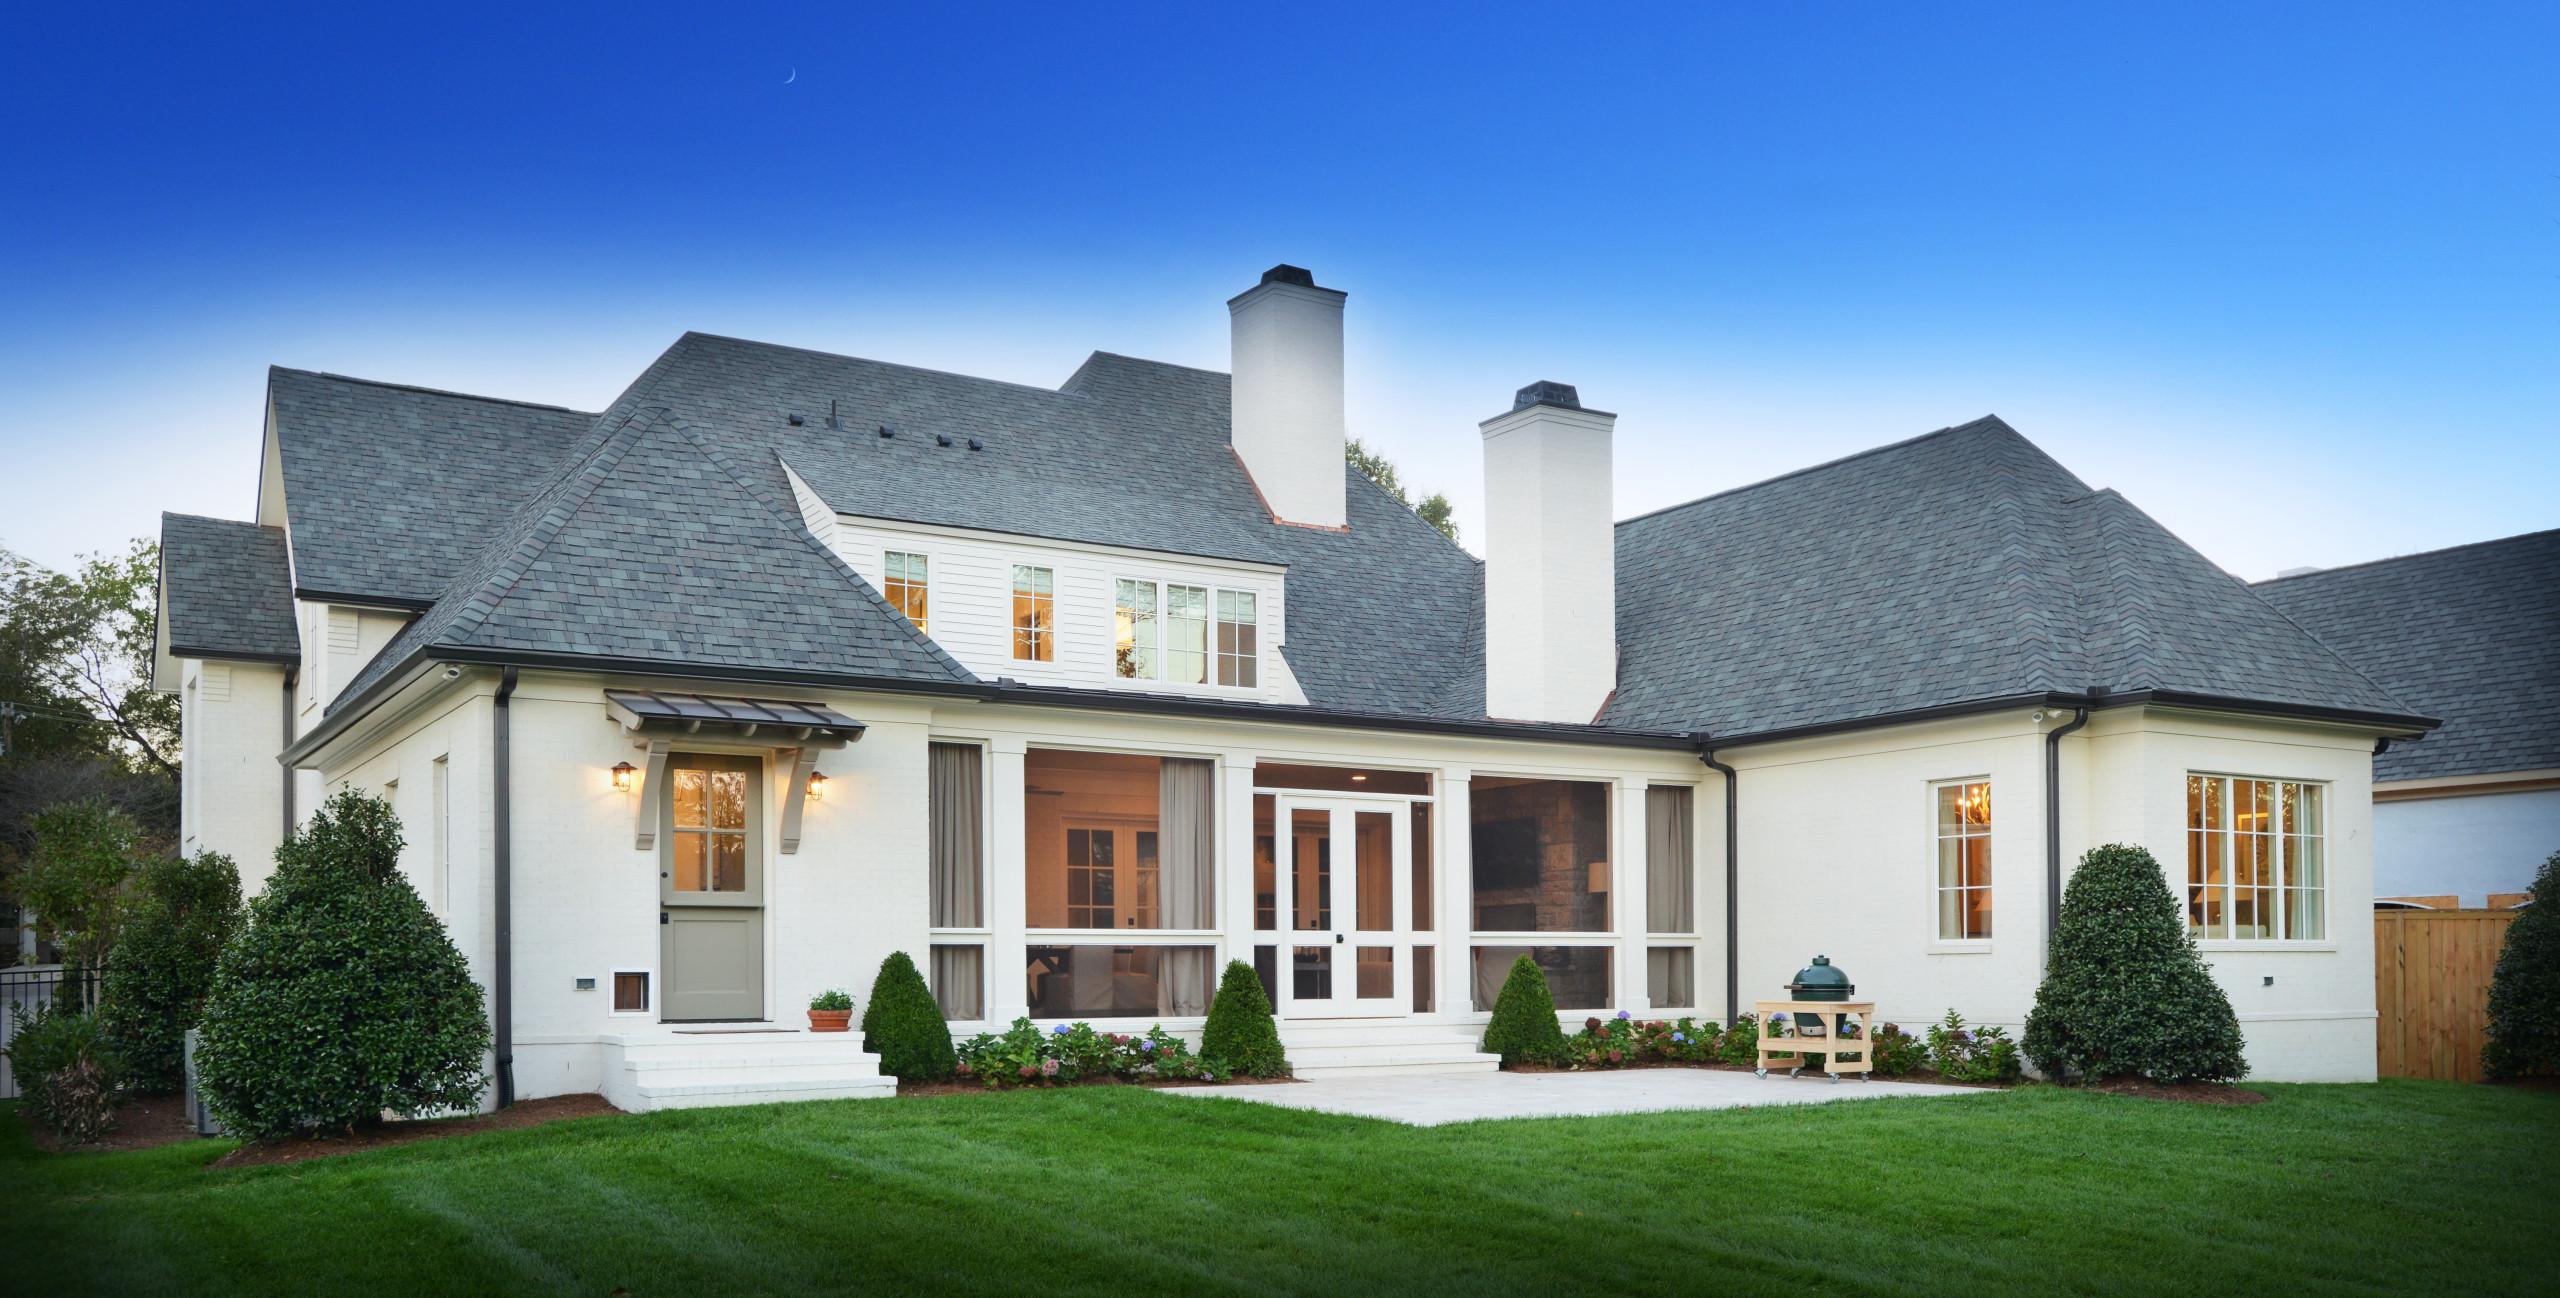 Custom Castle Home in Brentwood, TN